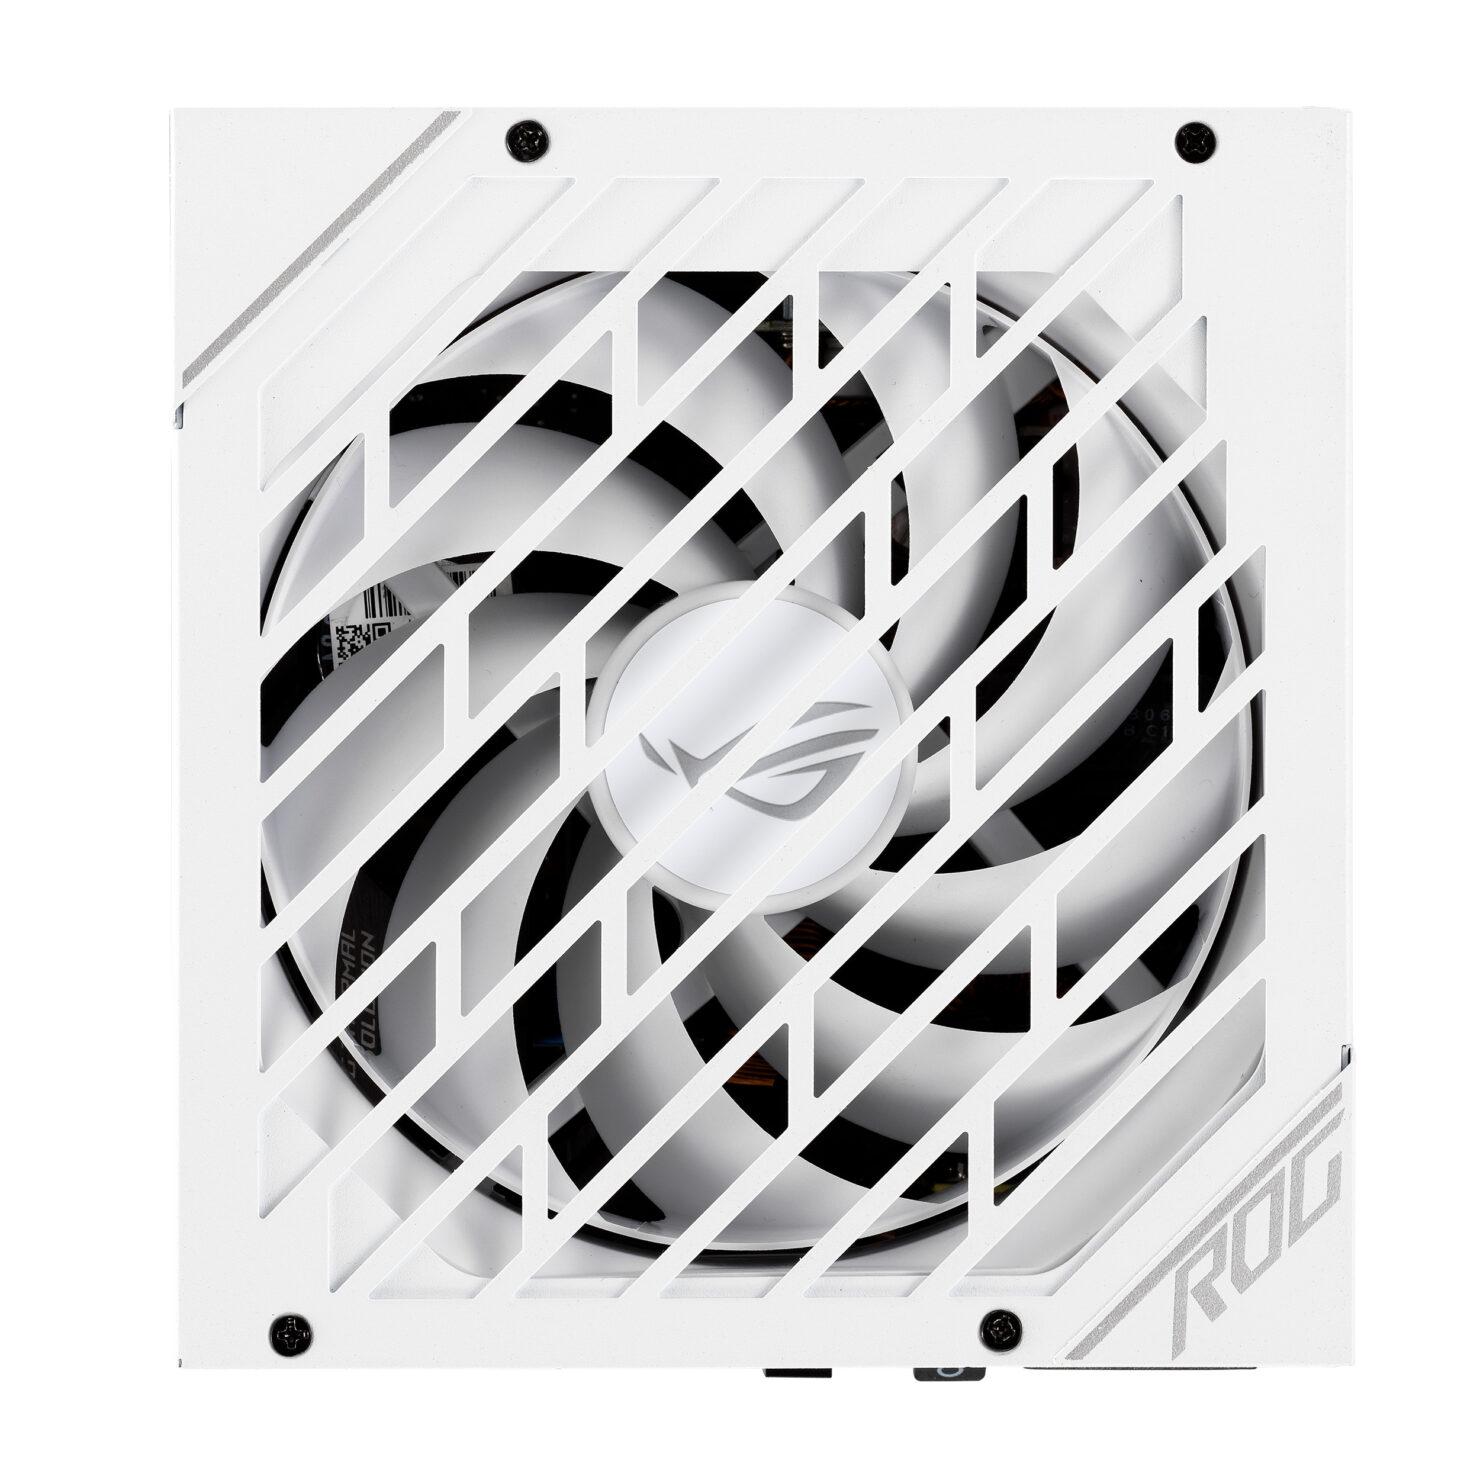 rog-strix-850w-white-edition_5